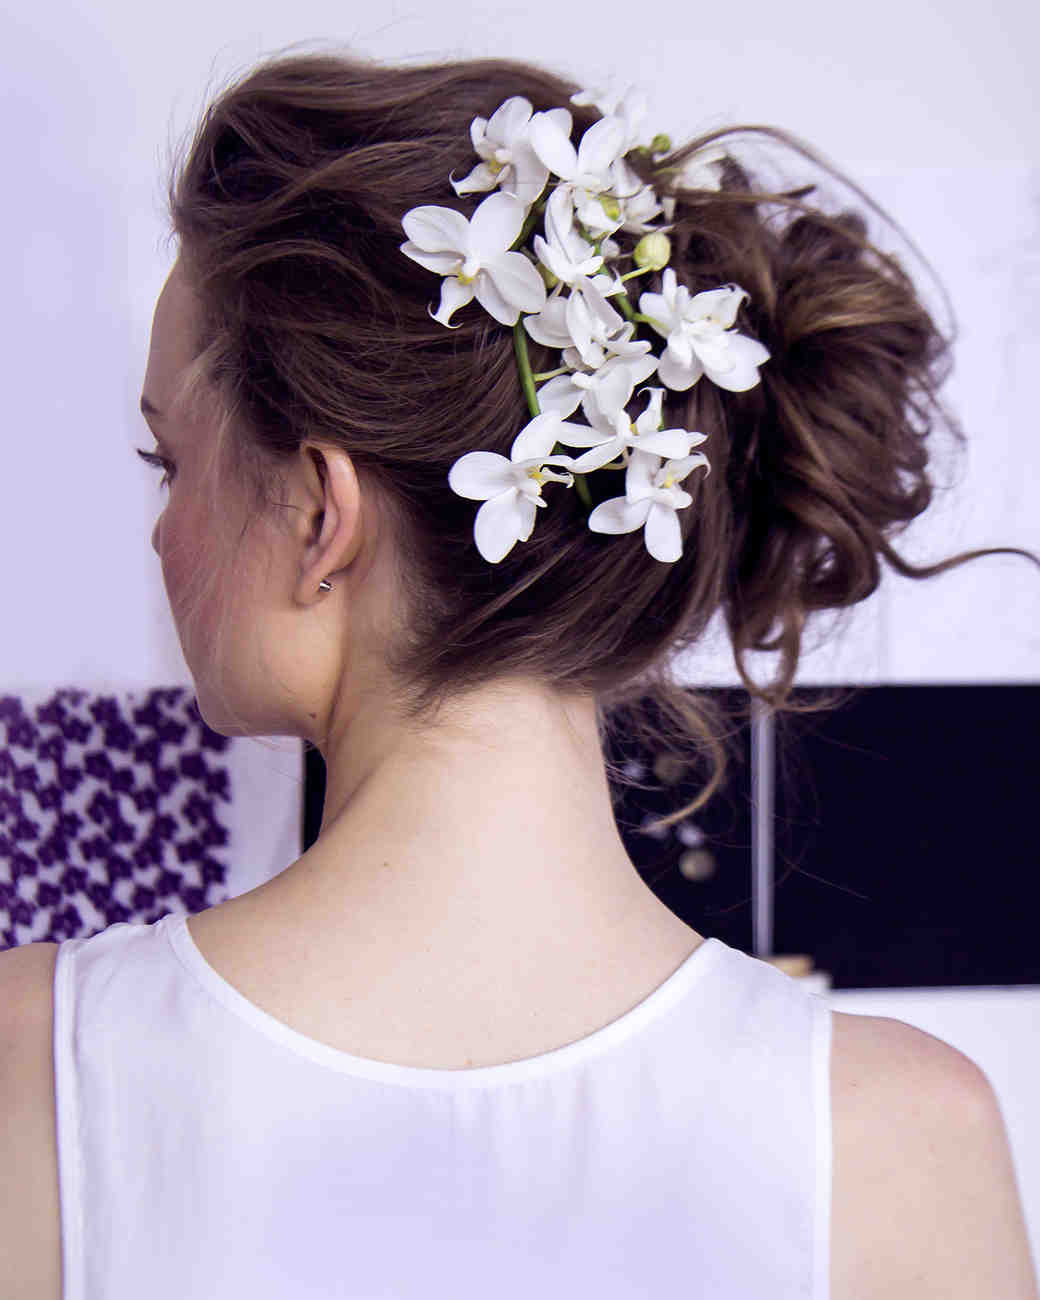 bridal-hair-adornments-spring2016-angel-sanchez-0415.jpg